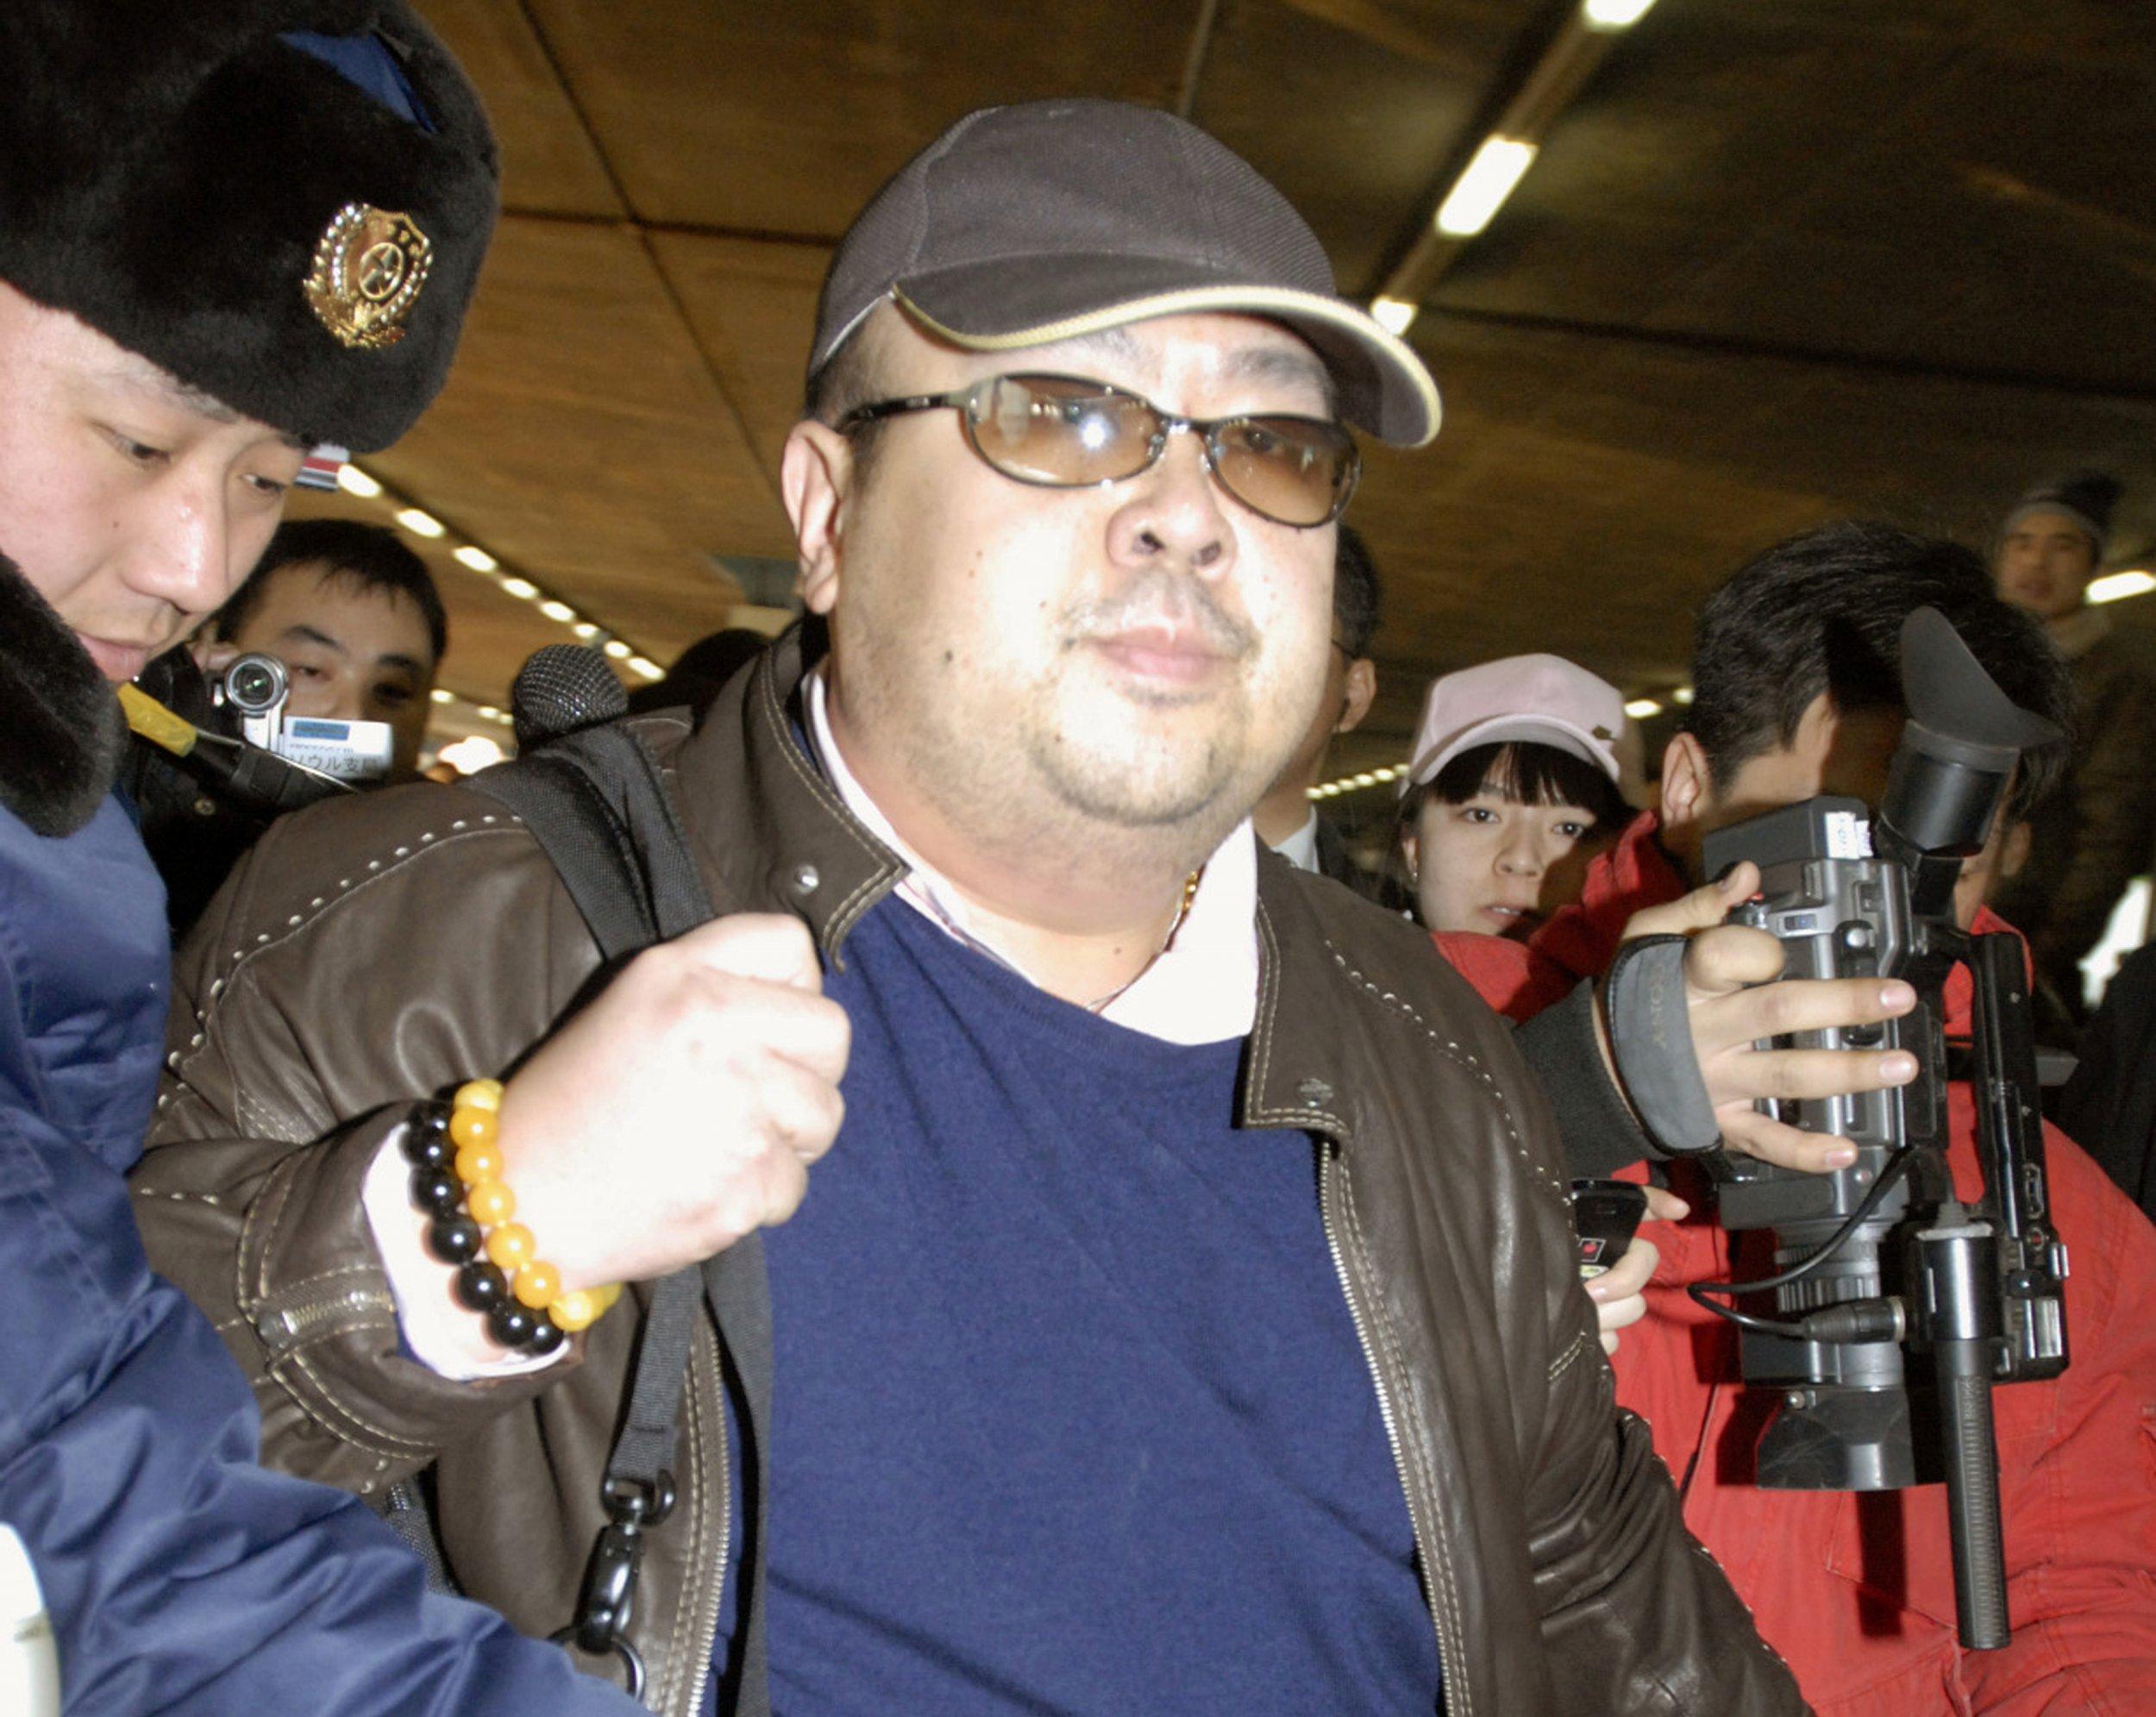 RTSYPNN Kim Jong Nam